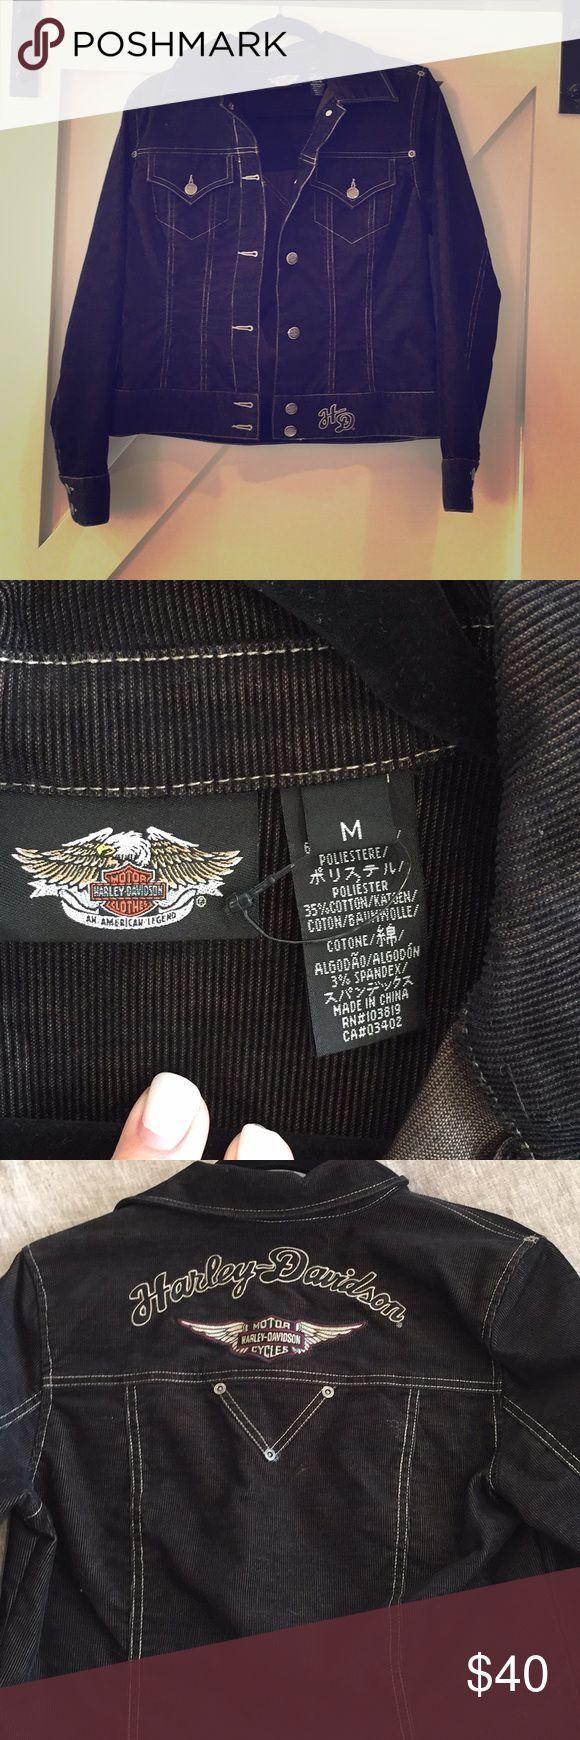 Ladies Harley Davison jacket Beautiful Harley Davidson jacket in excellent condition size medium Harley-Davidson Jackets & Coats